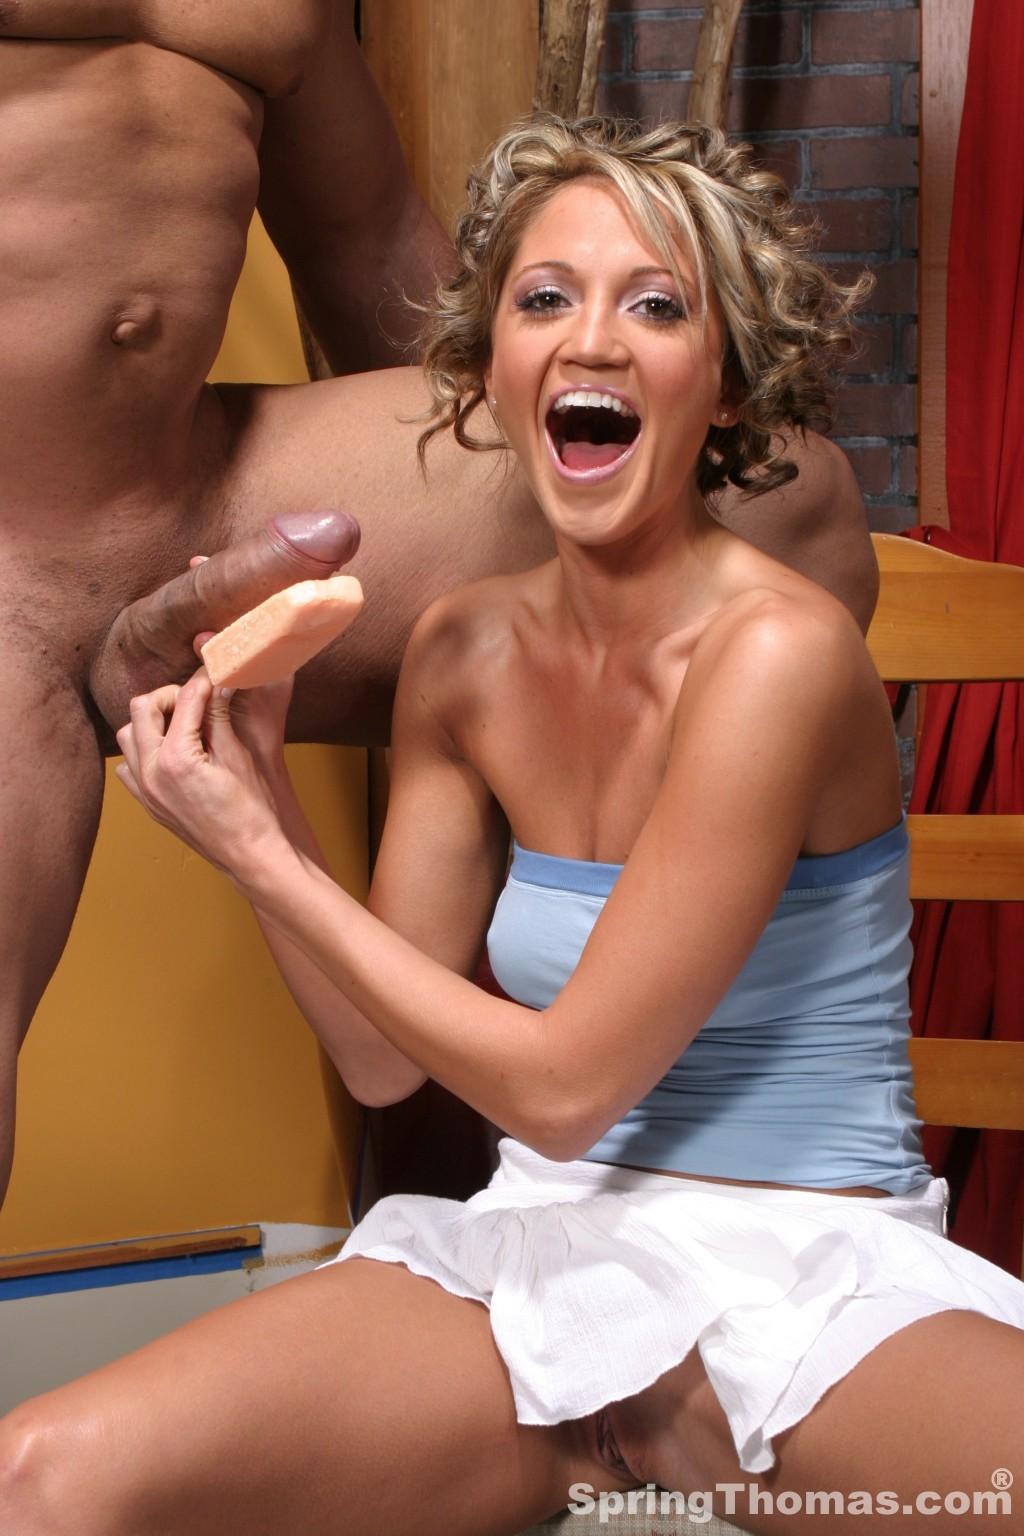 Lynda carter at a nude beach